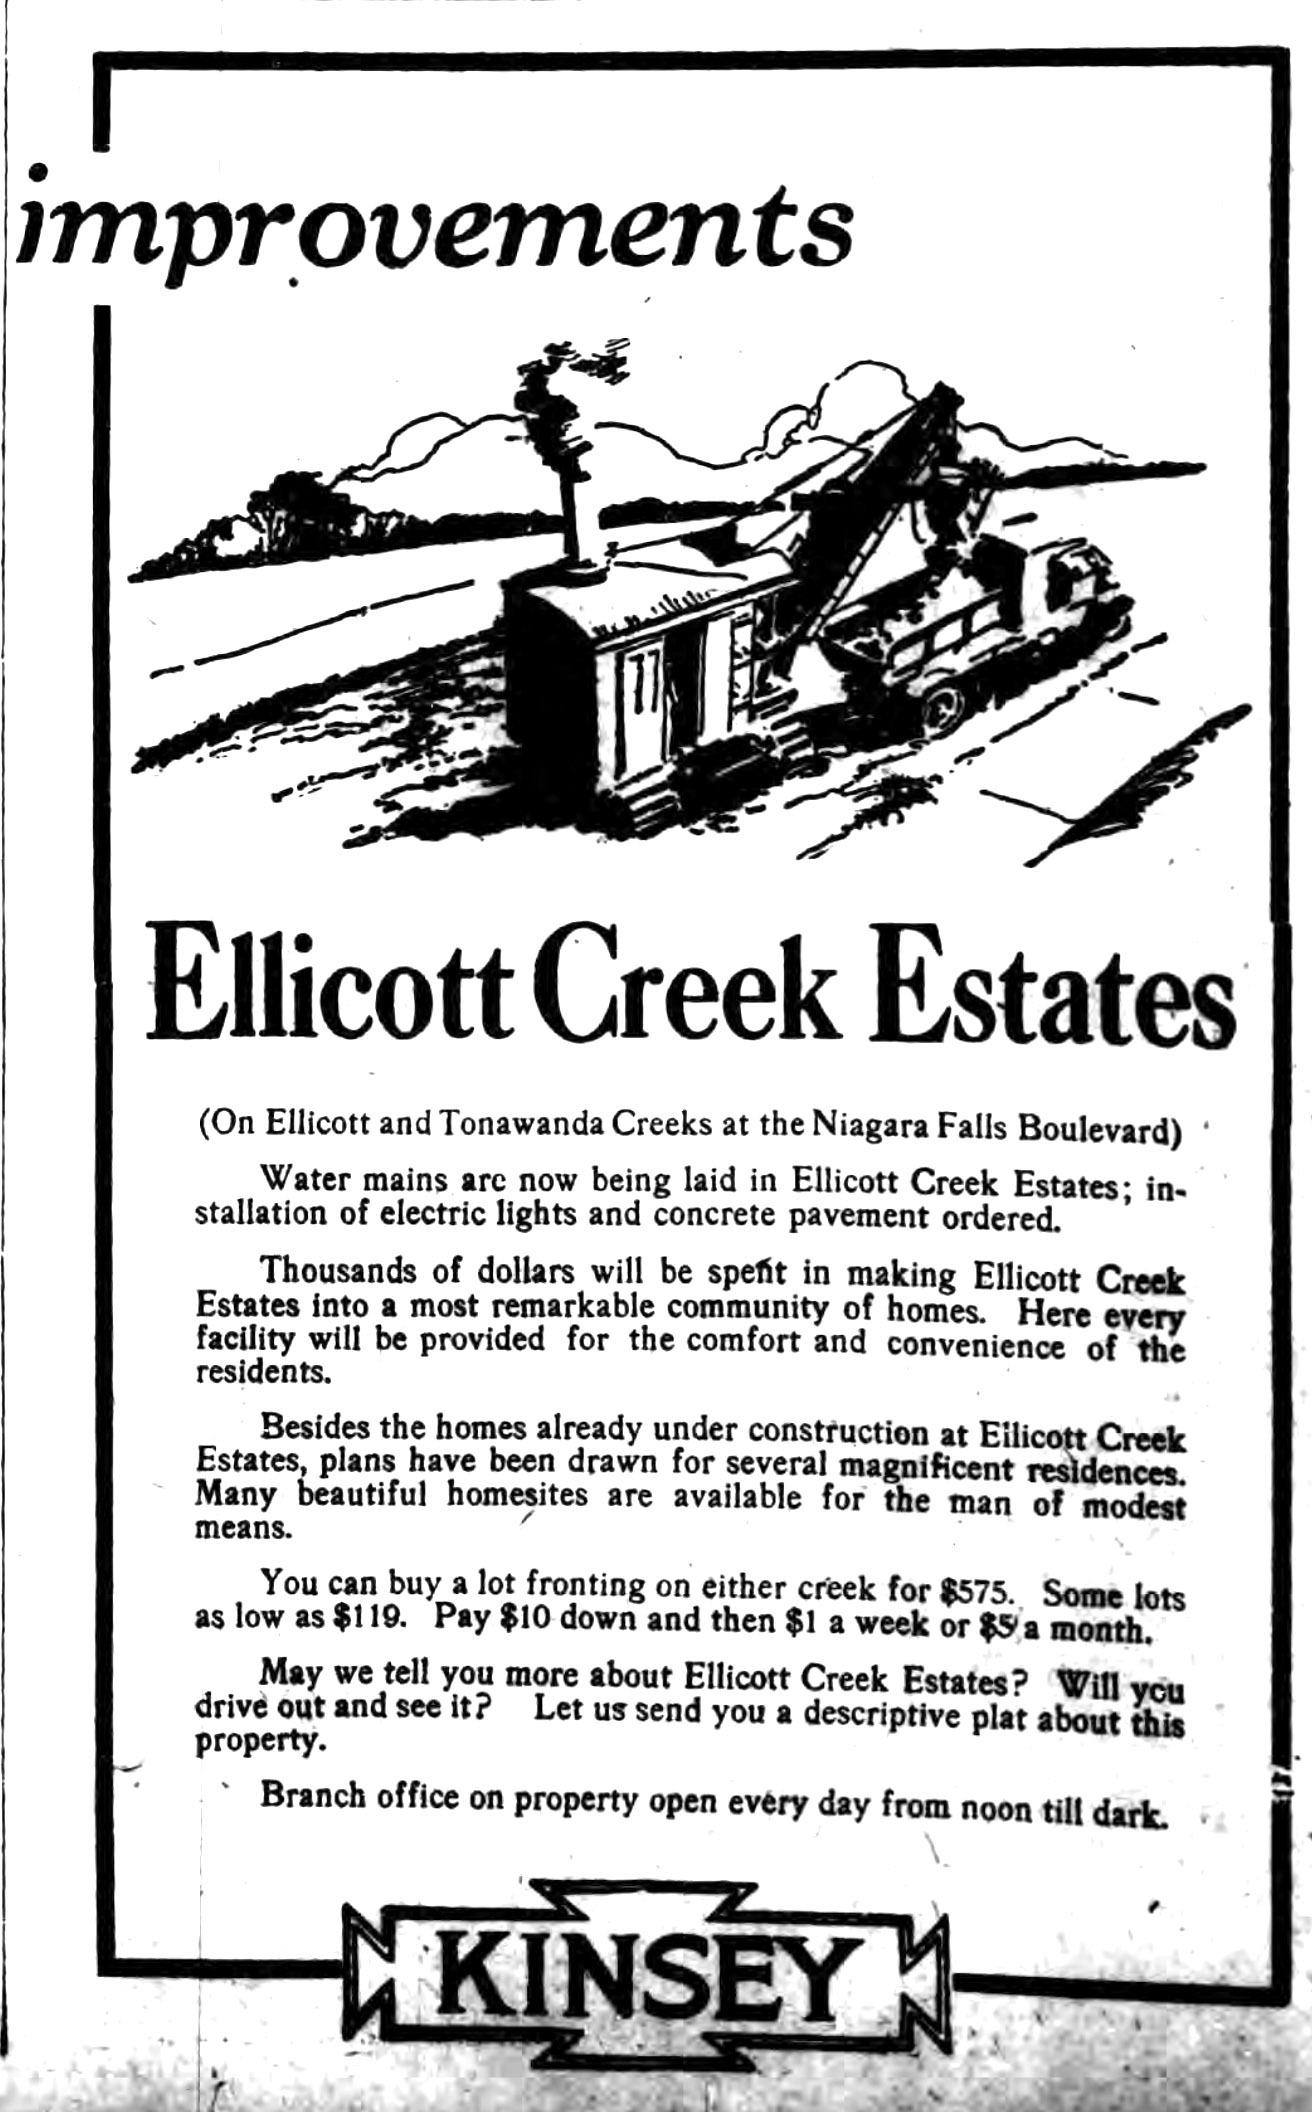 Ellicott Creek Estates, ad (Buffalo Courier, 1925-08-22).jpg